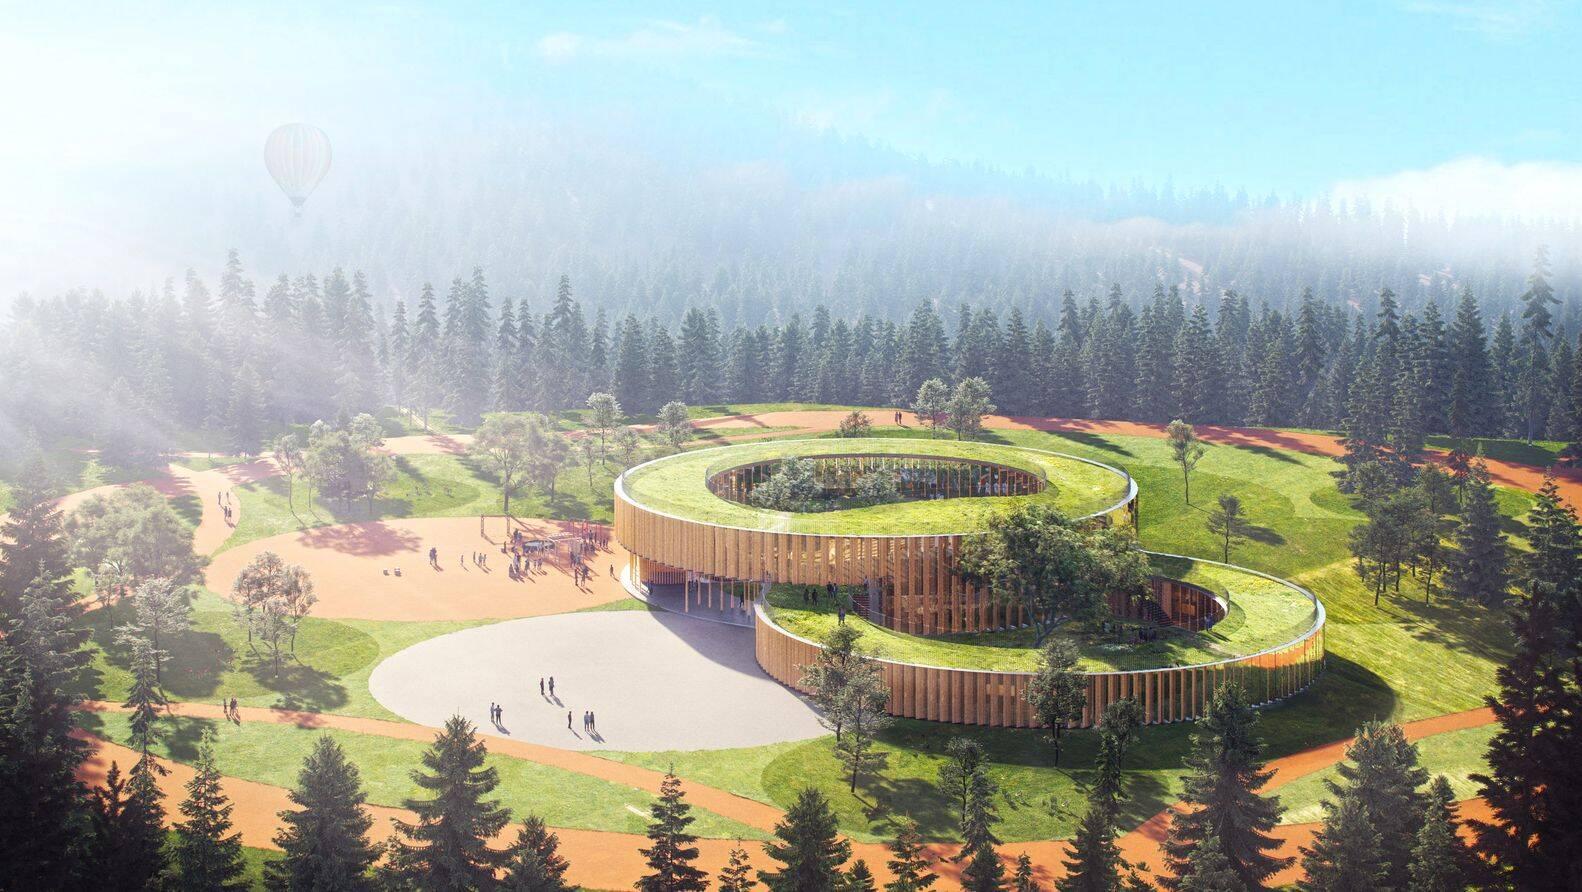 Projeto apresenta escola integrada à natureza no pós-pandemia